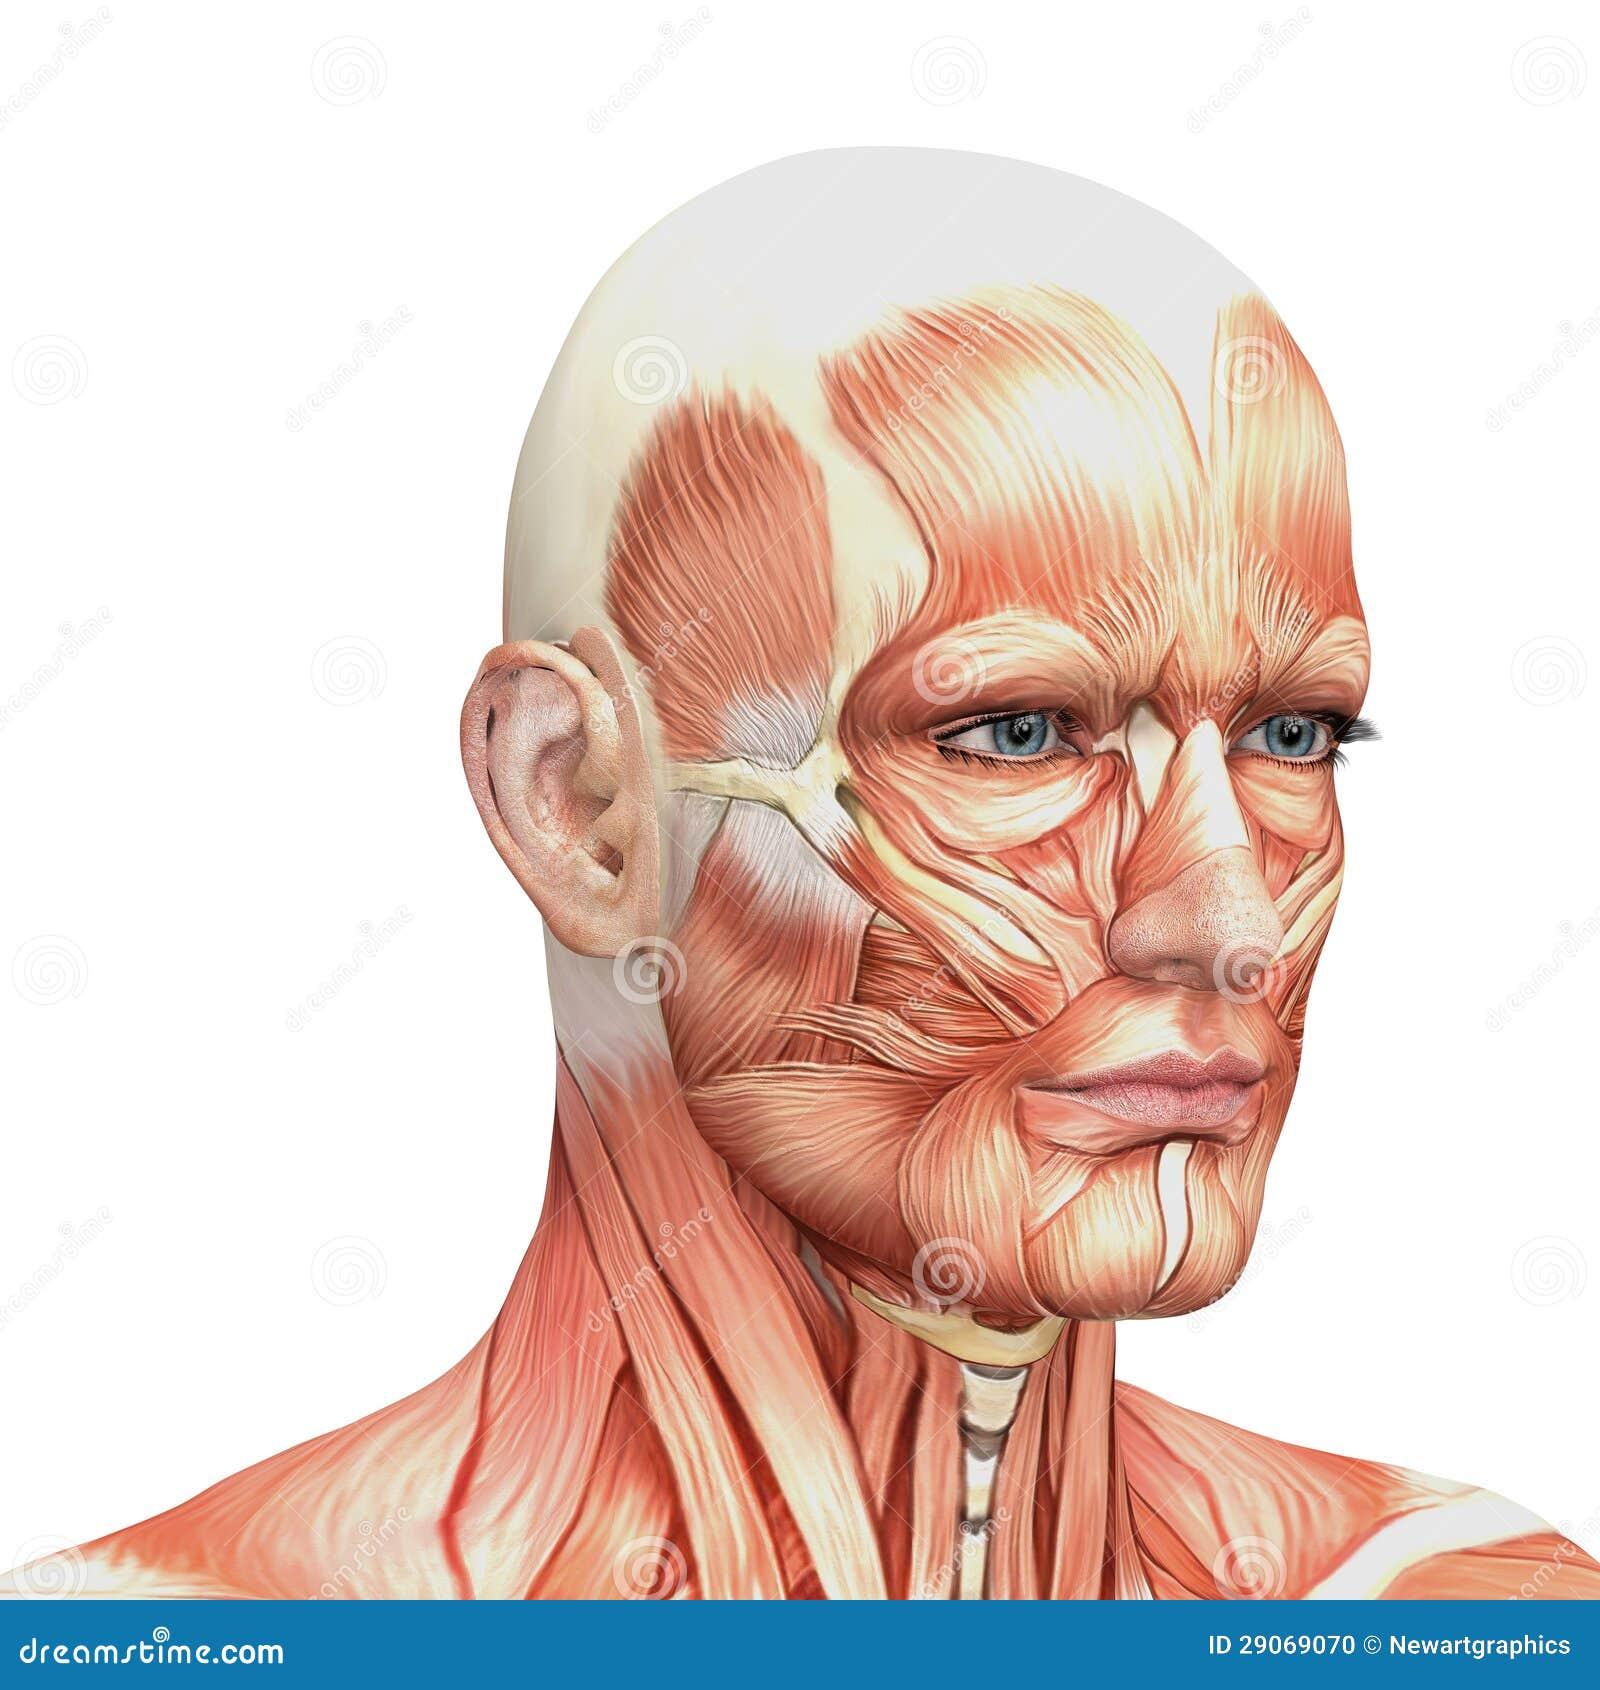 Facial anatomy diagram